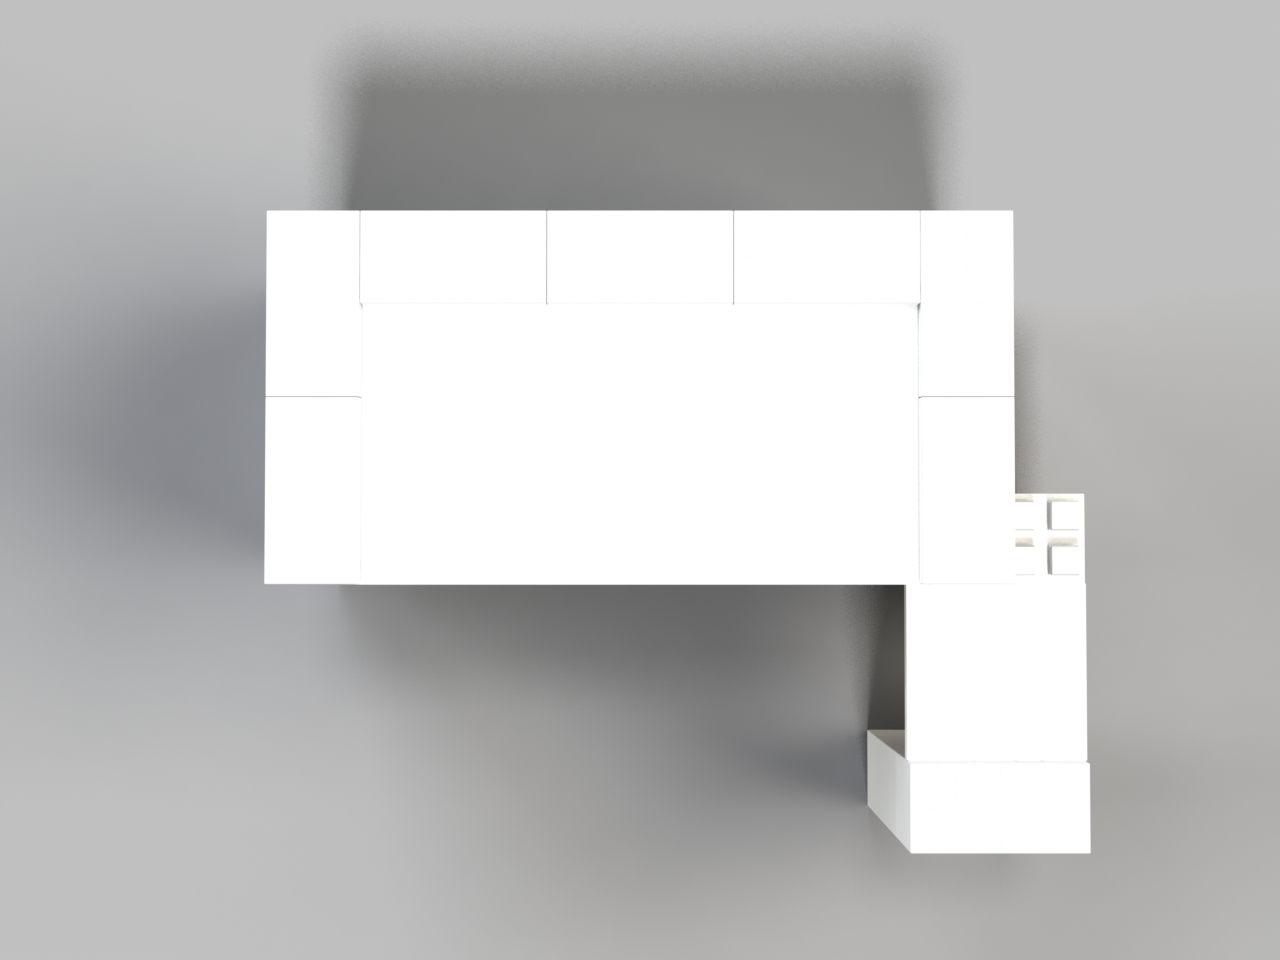 PO003 - Table 42ft+32_W-G Top.JPG